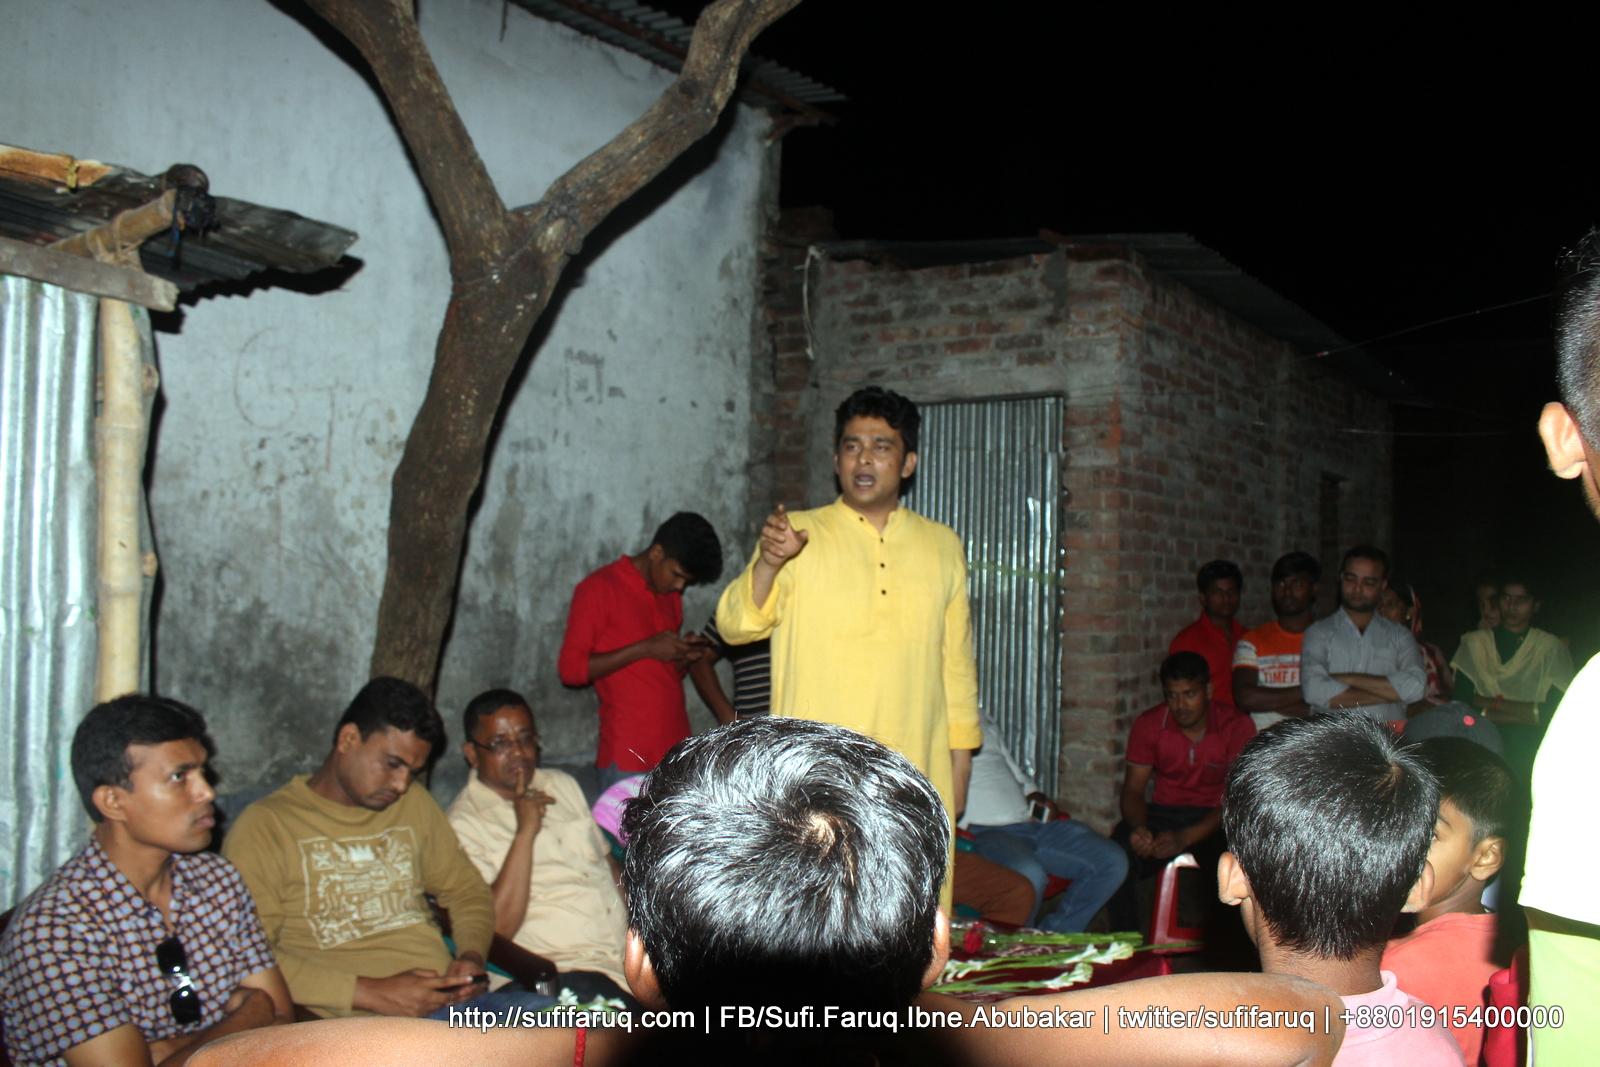 View Exchange with Horijon Shomproday Kumarkhali Powroshobha 78 কুমারখালী পৌরসভার হরিজন সম্প্রদায়ের ভাইবোনদের কাছে - জননেত্রী শেখ হাসিনাকে পুনরায় প্রধানমন্ত্রী নির্বাচিত করার আহবান, গণসংযোগ ও উন্নয়ন আলোচনা।